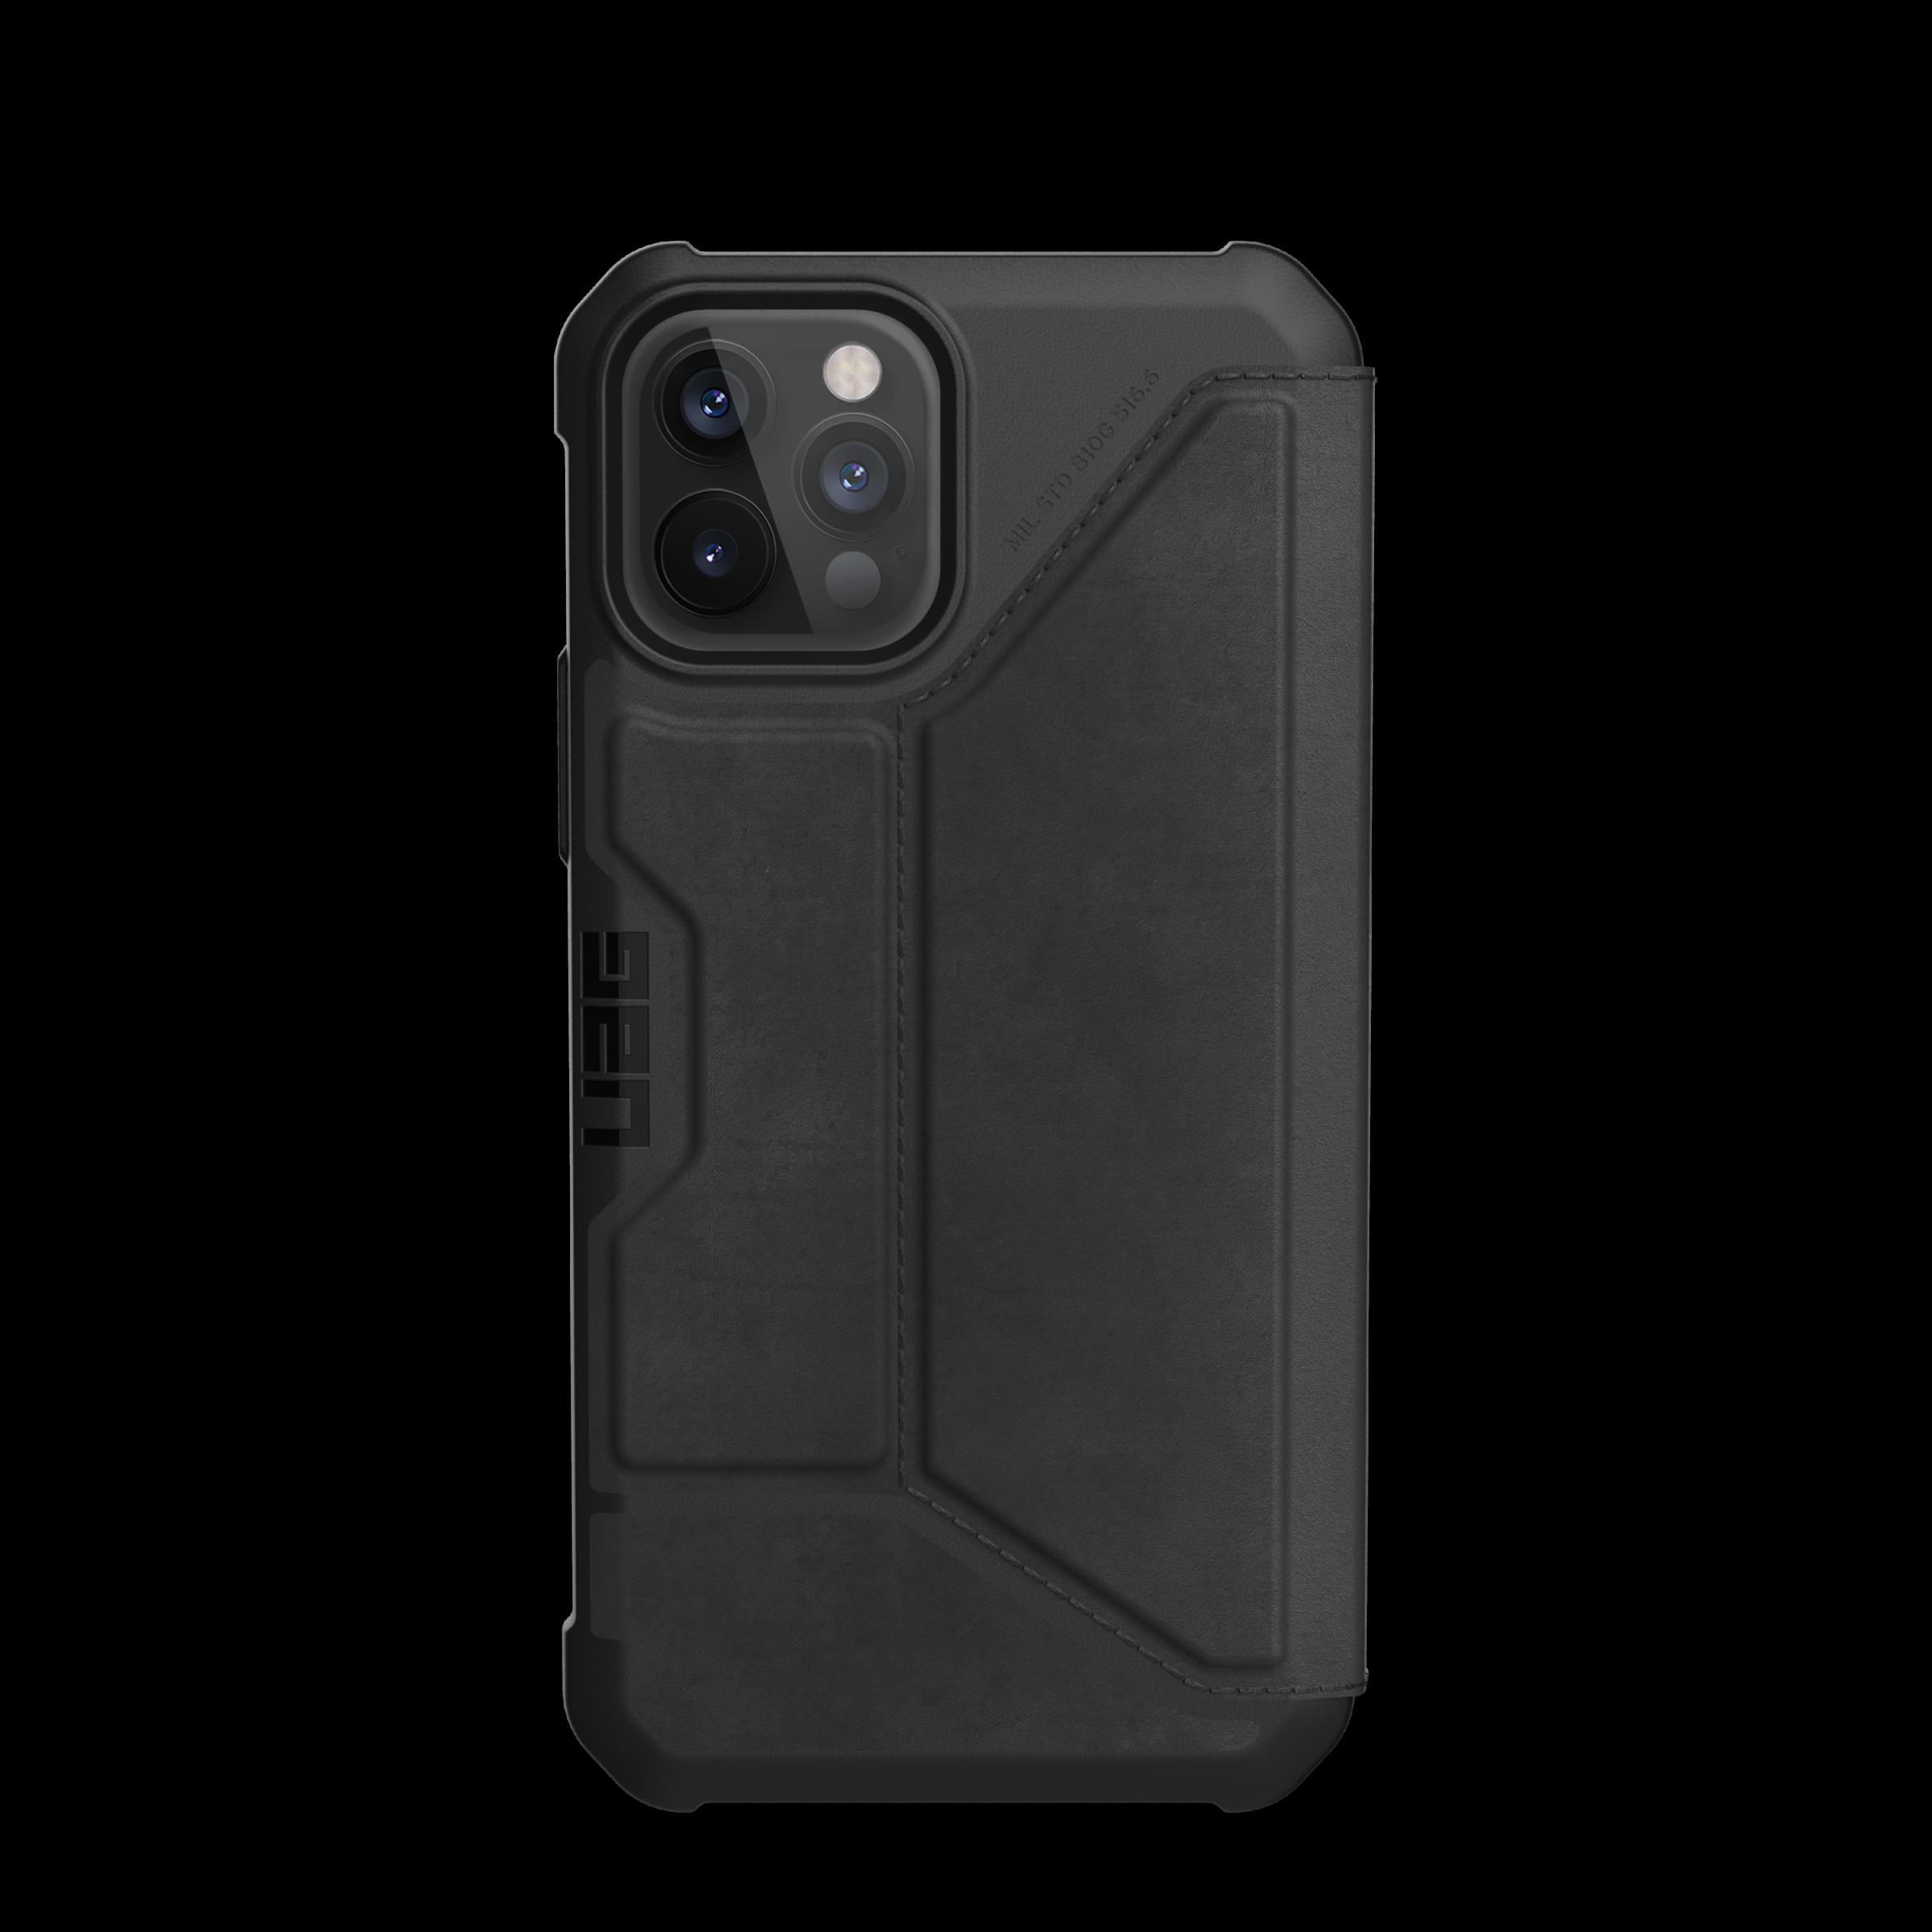 Metropolis Wallet Case iPhone 12 Pro Max Leather Black